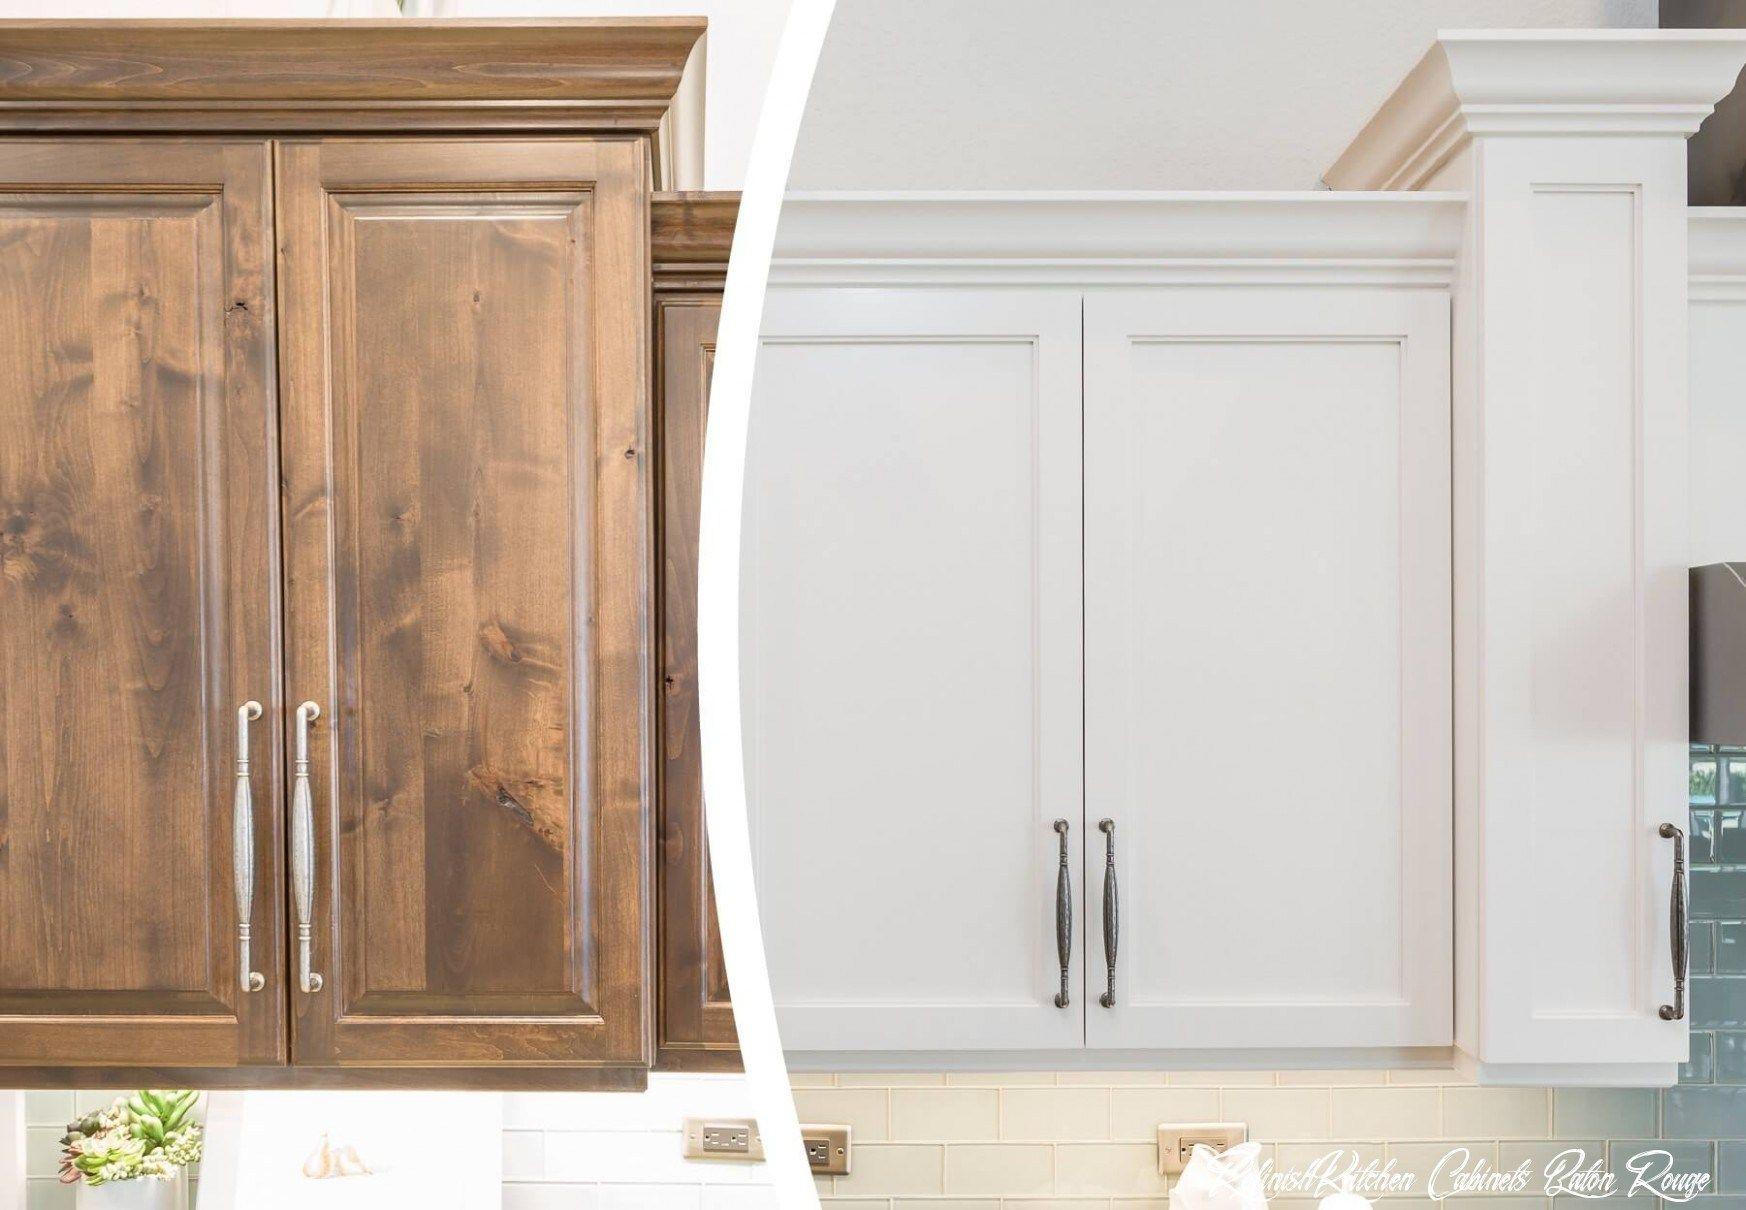 12 Refinish Kitchen Cabinets Baton Rouge In 2020 Cabinet Door Replacement New Kitchen Cabinet Doors Refacing Kitchen Cabinets